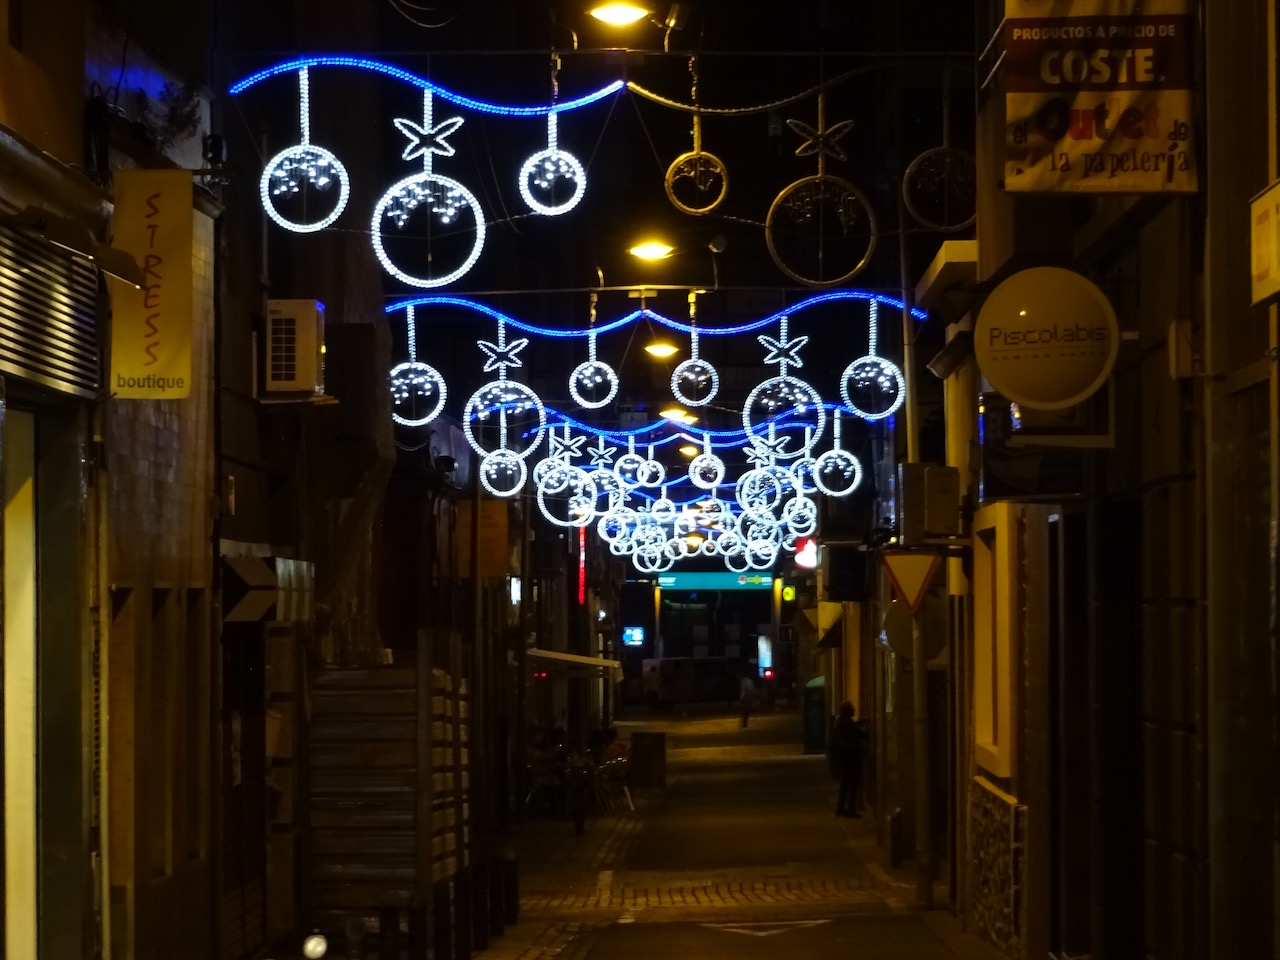 Weihnachtsbeleuchtung 5